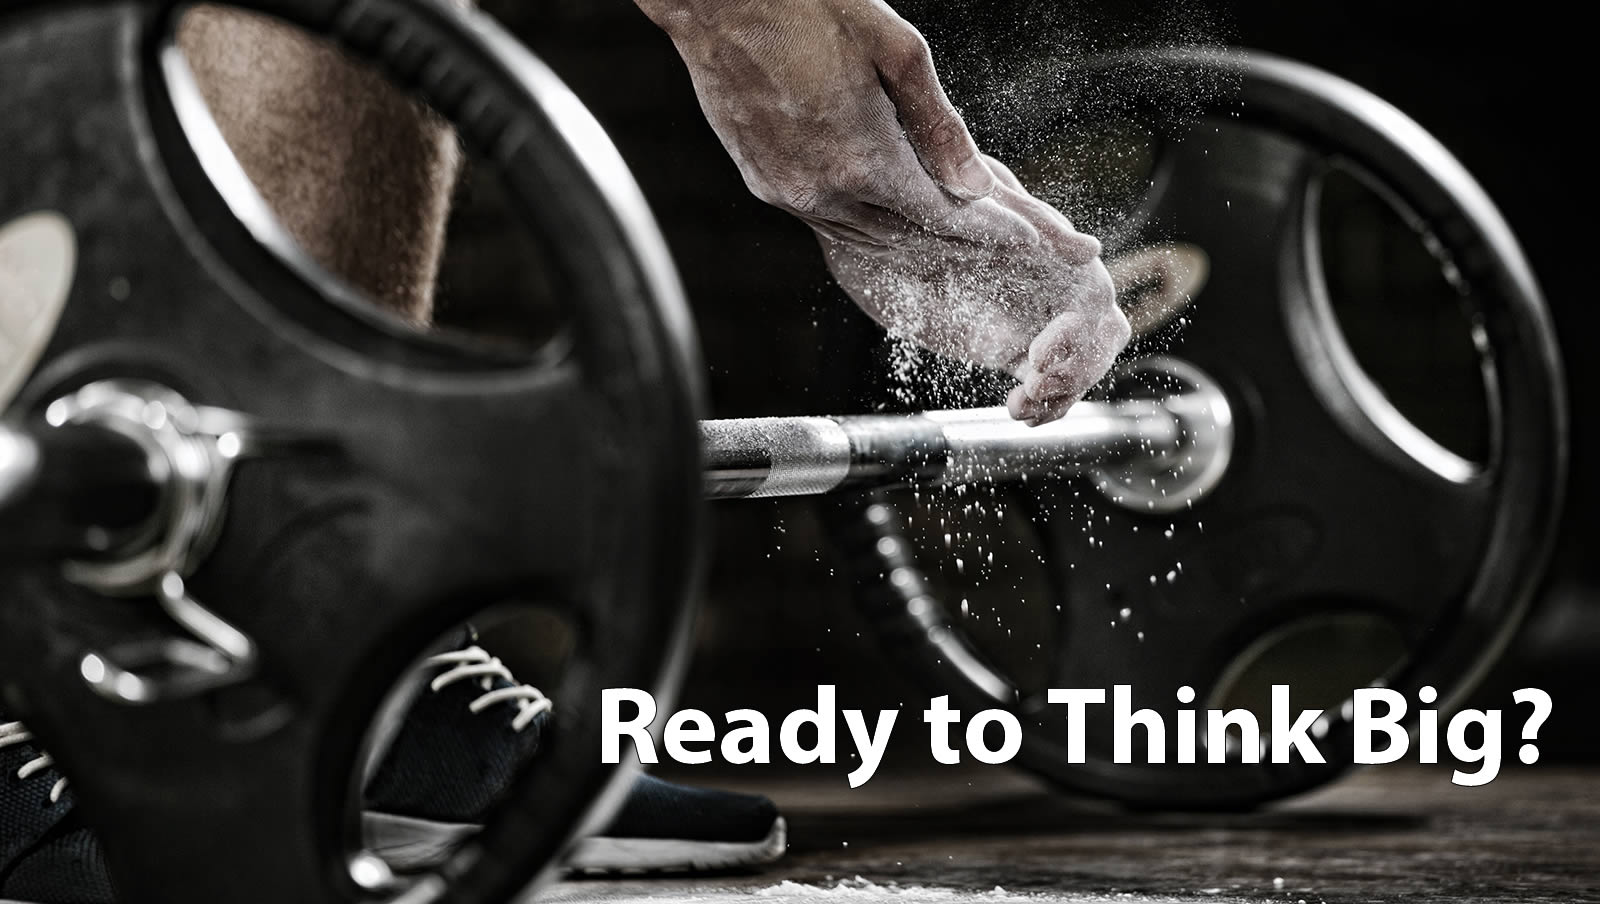 Ready to Think Big?